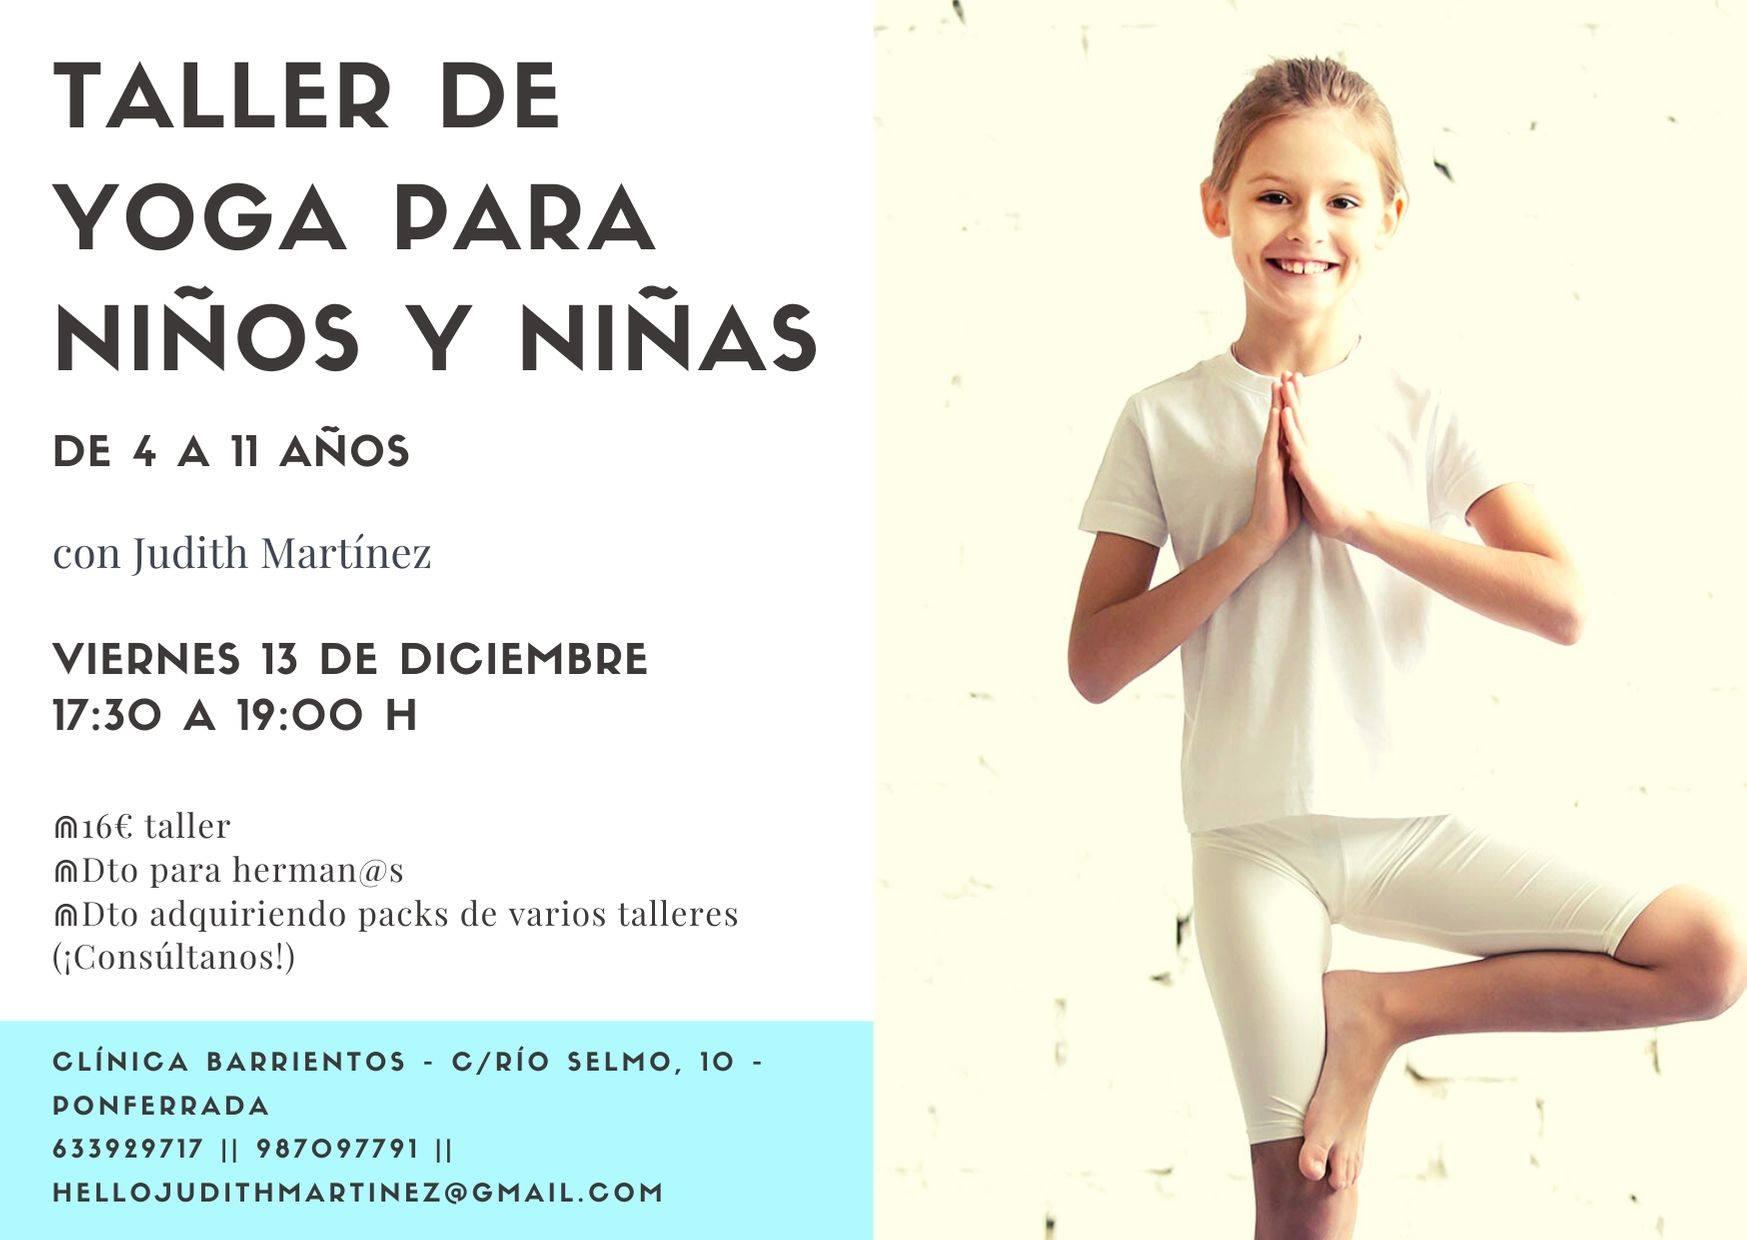 Clínica Barrientos organiza un taller de Yoga para niños 2